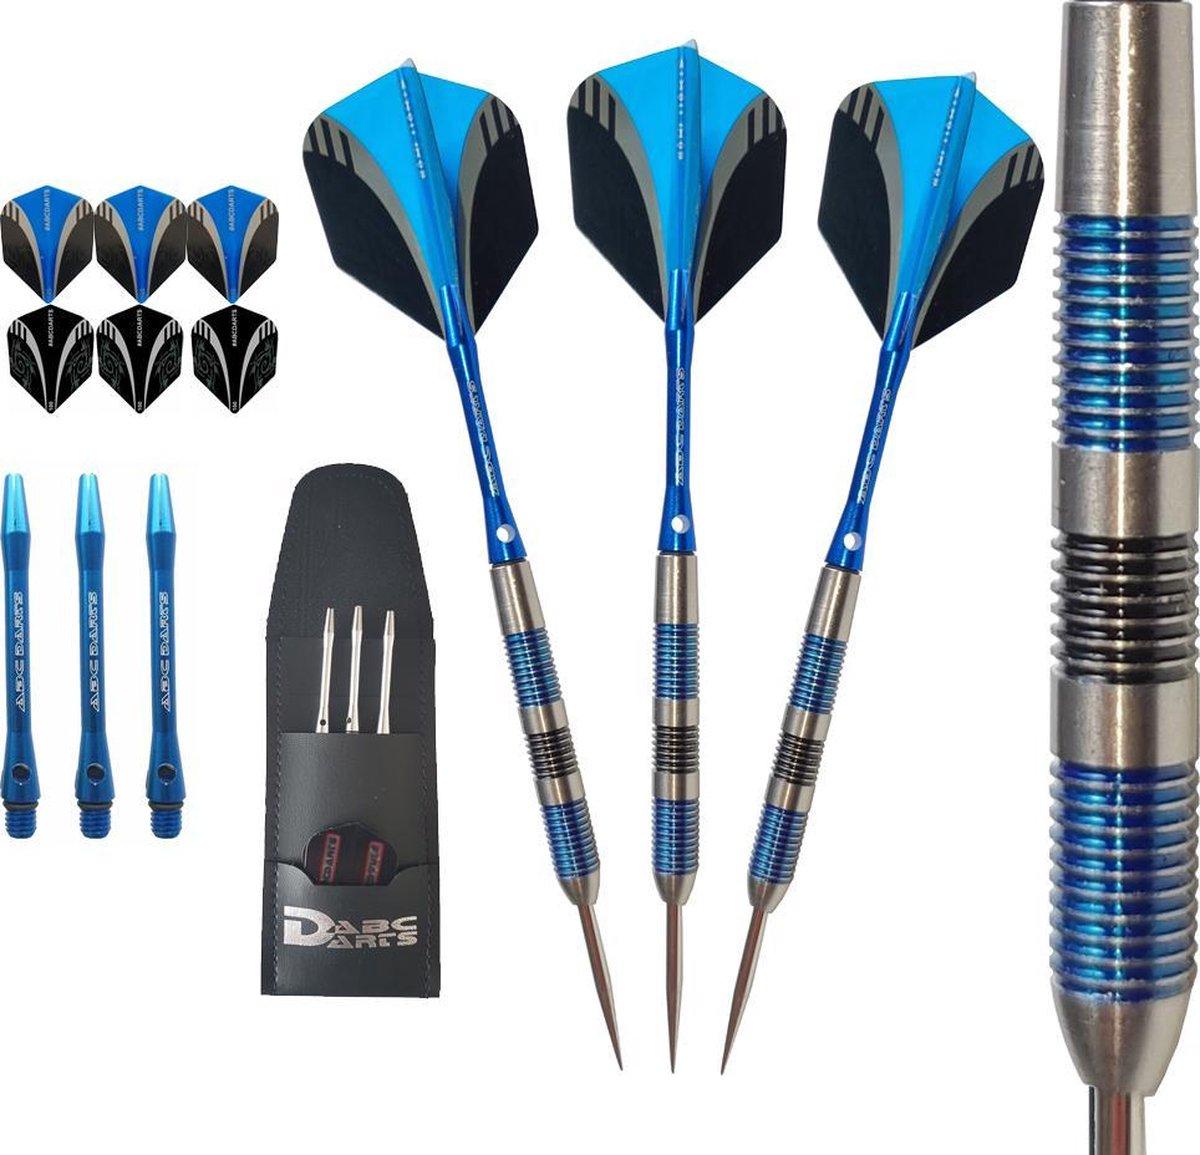 ABC Darts Professionele Dartpijlen - Originals Blue Jack Tonners - 22 gram